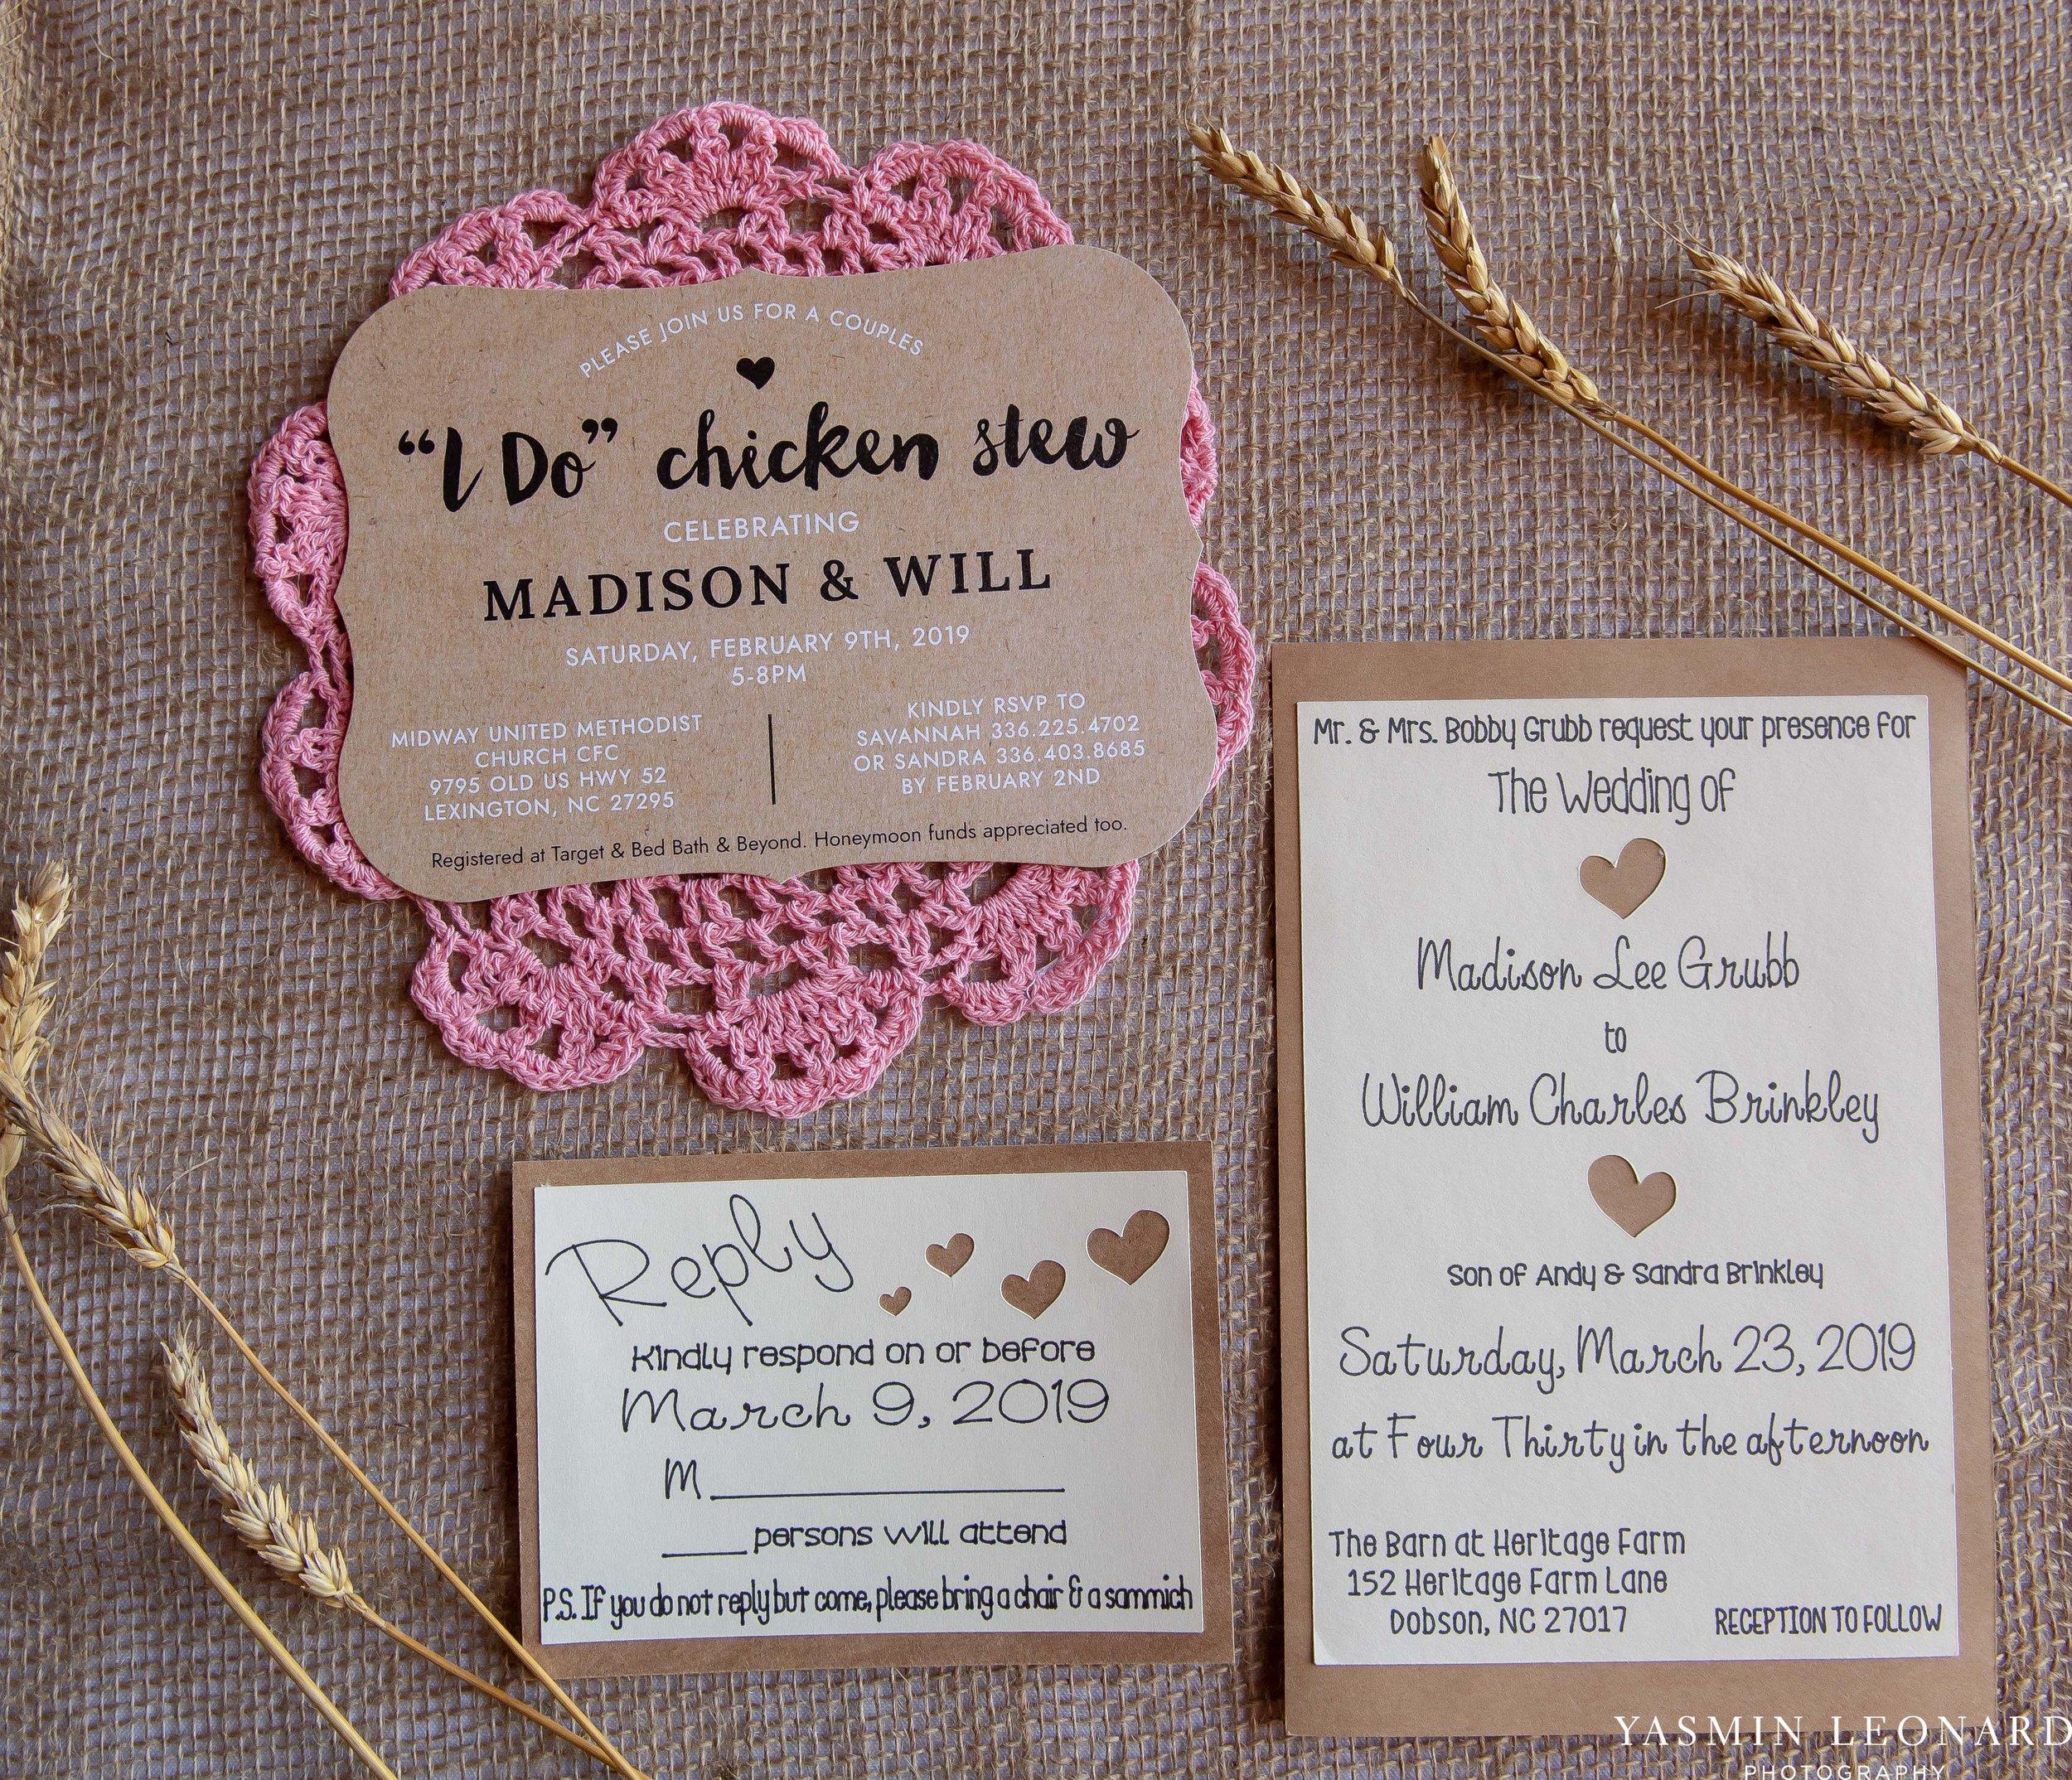 The Barn at Heritage Farm - Country Wedding - Pink and Blue Wedding - Barn Wedding - Outdoor Wedding - Cotton and Wheat Decor - Groom in Bibs - Pink Bridal Colors - Yasmin Leonard Photography-5.jpg